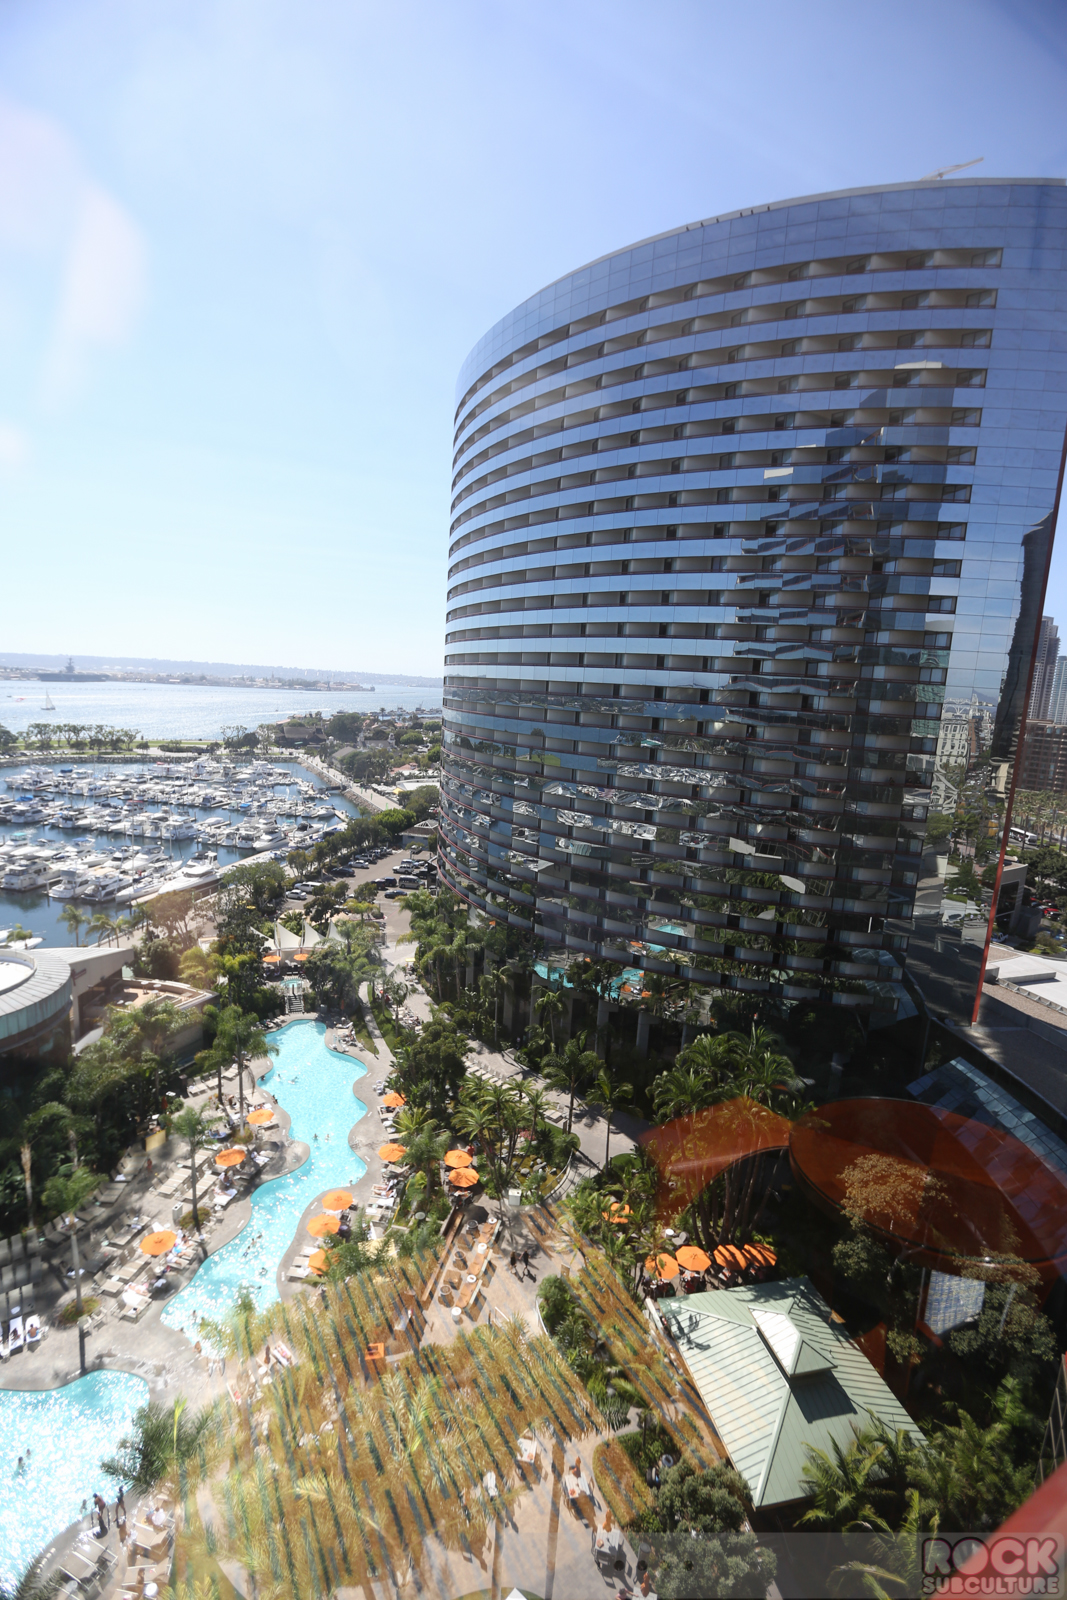 Hotels Resorts Hotels San Diego: Hotel/Resort Review: San Diego Marriott Marquis & Marina